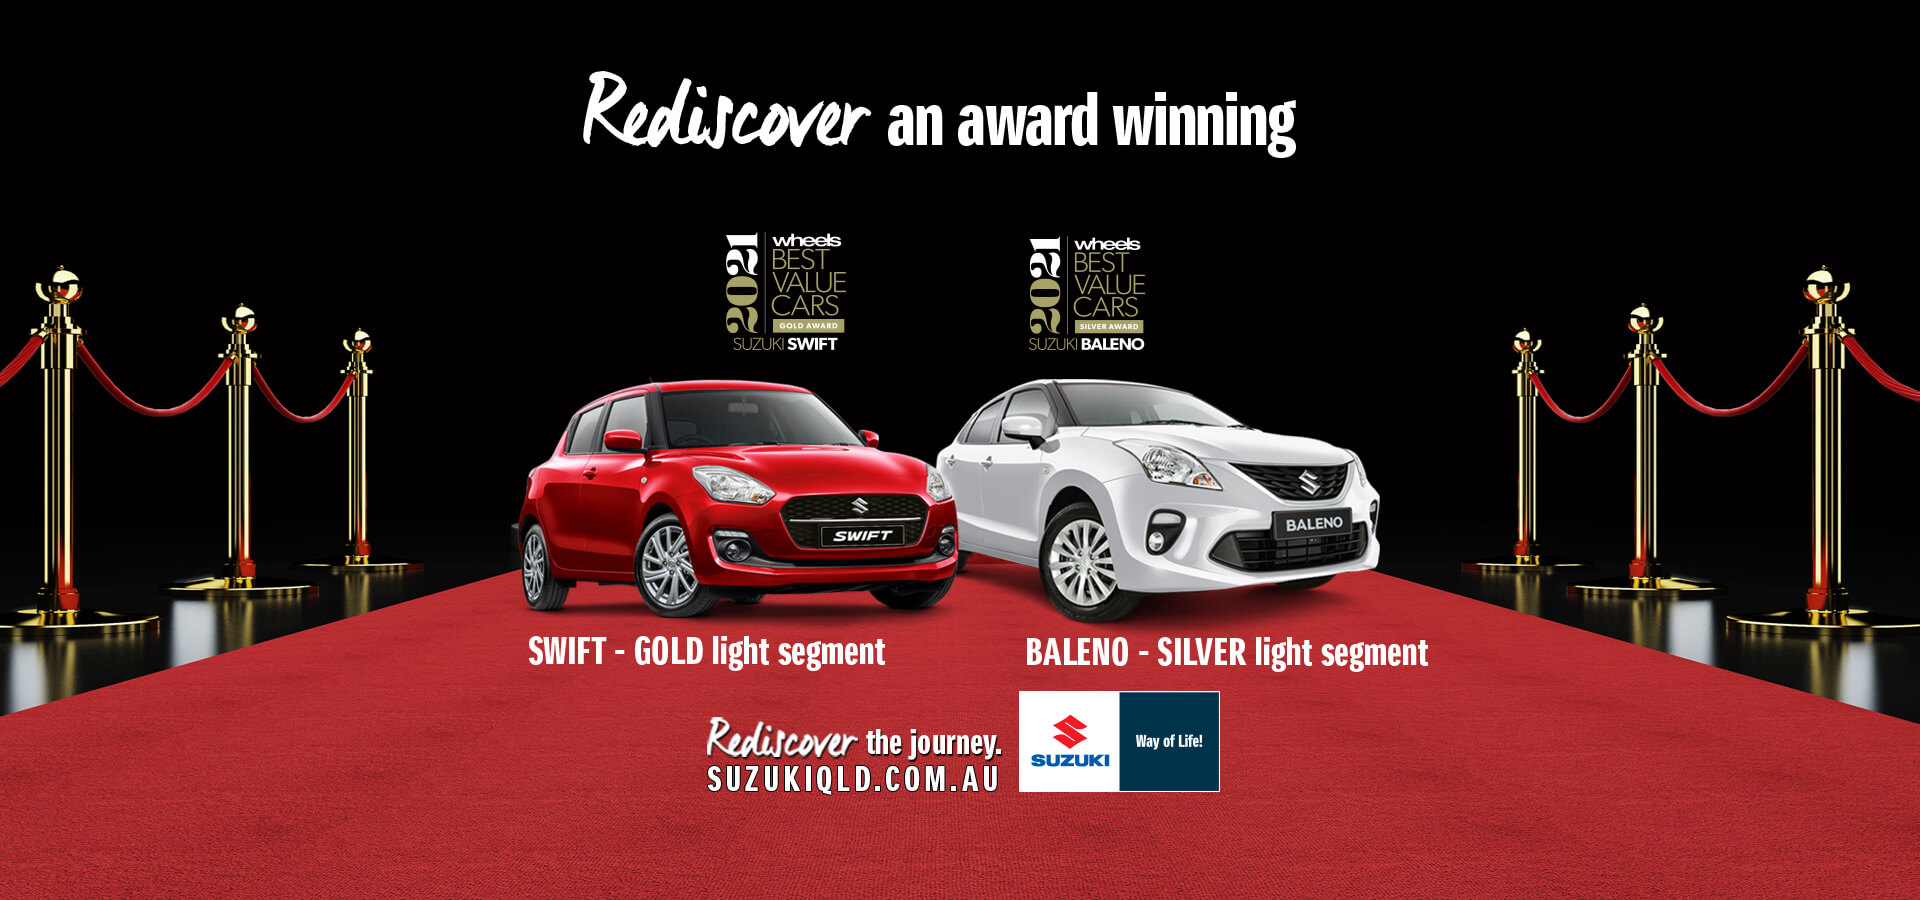 Rediscover the award winning Swift and Baleno